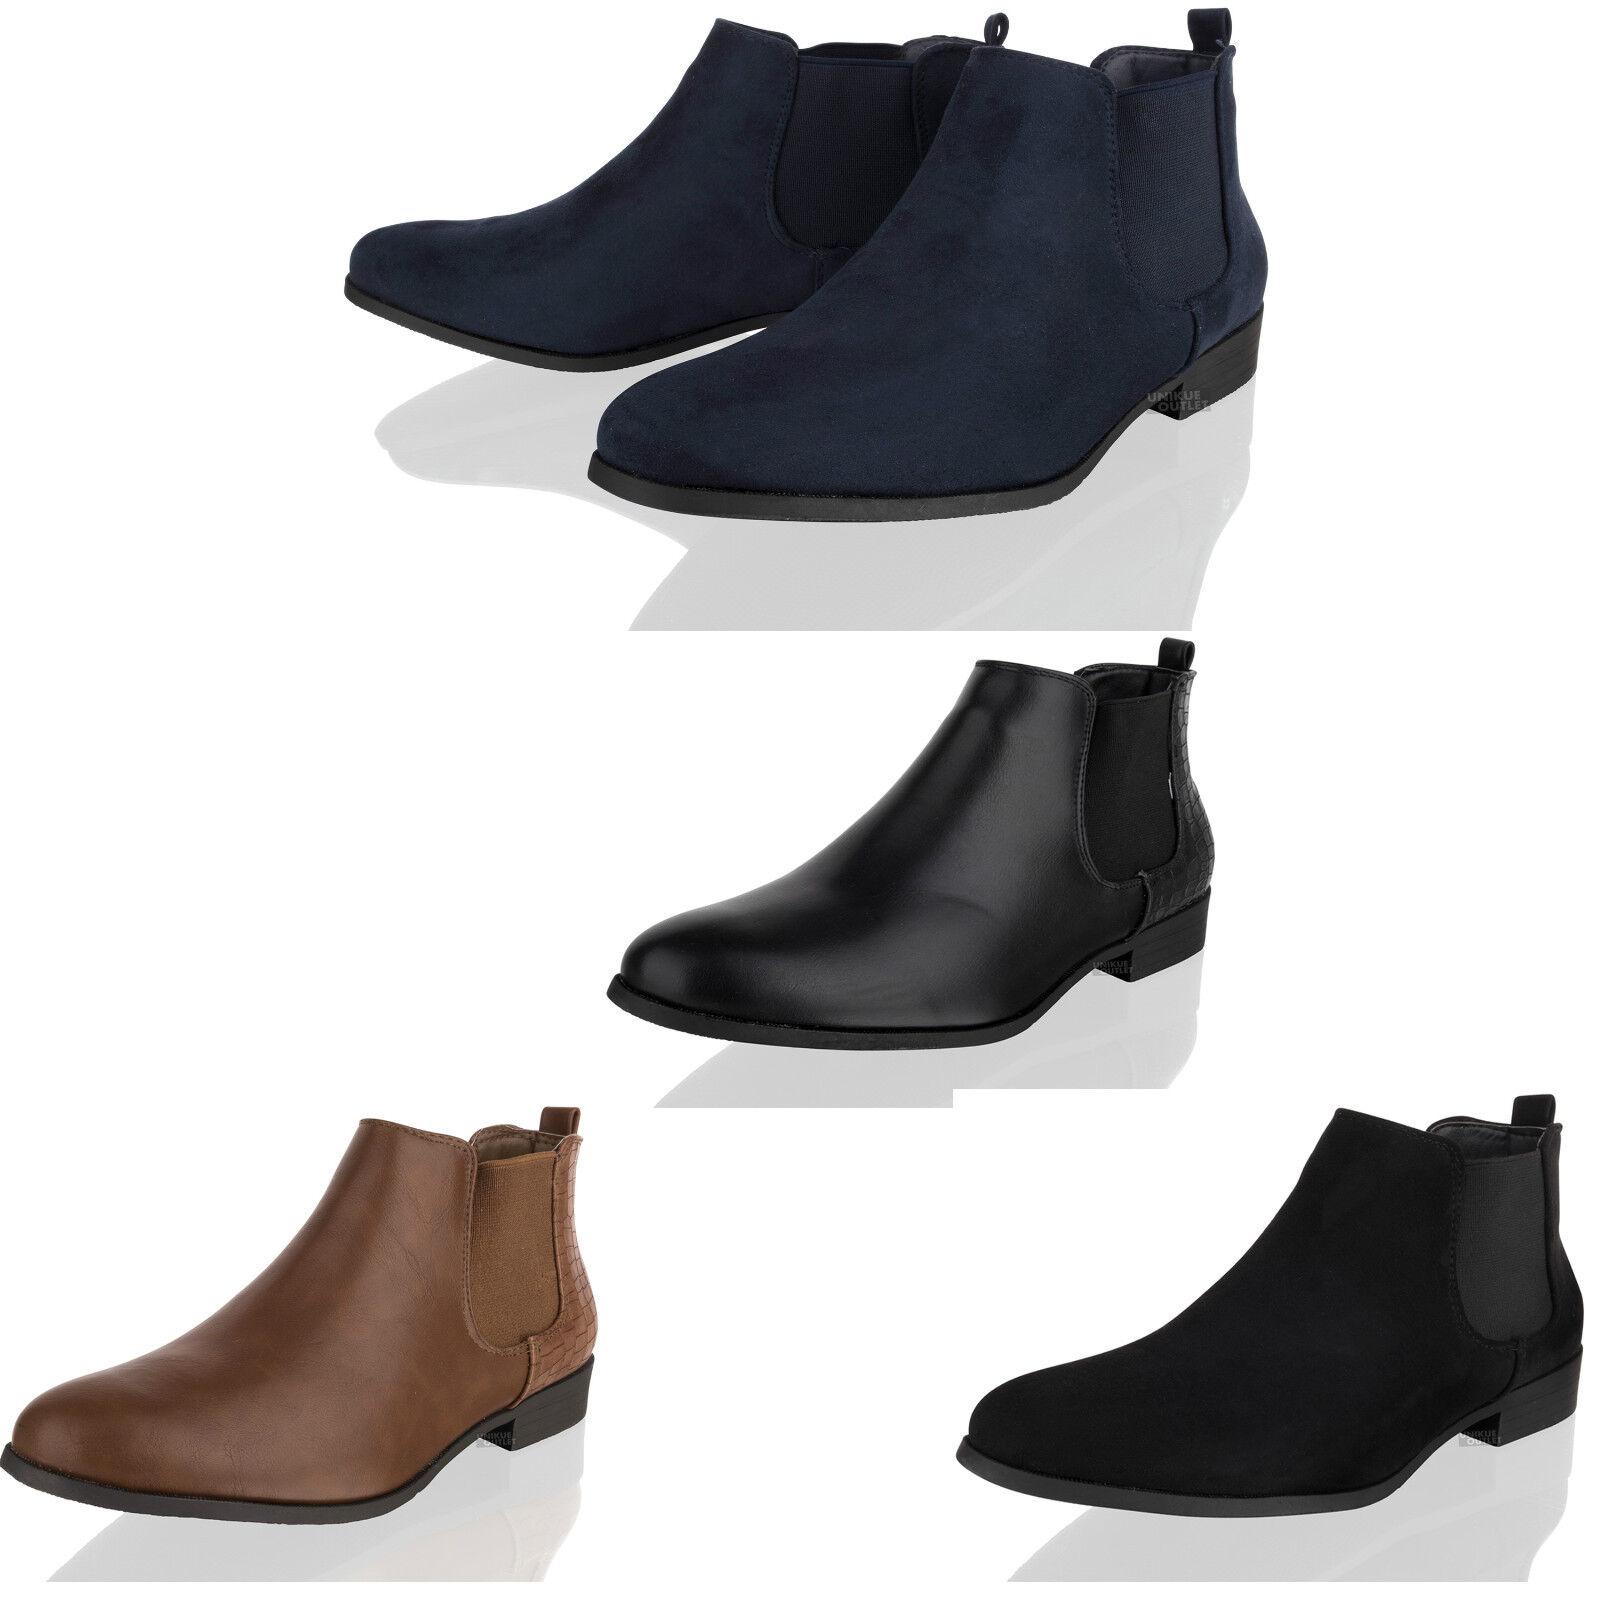 Womens Low Heel Chelsea Ladies Flat Block Heel Pixie Ankle Boots Shoes Size